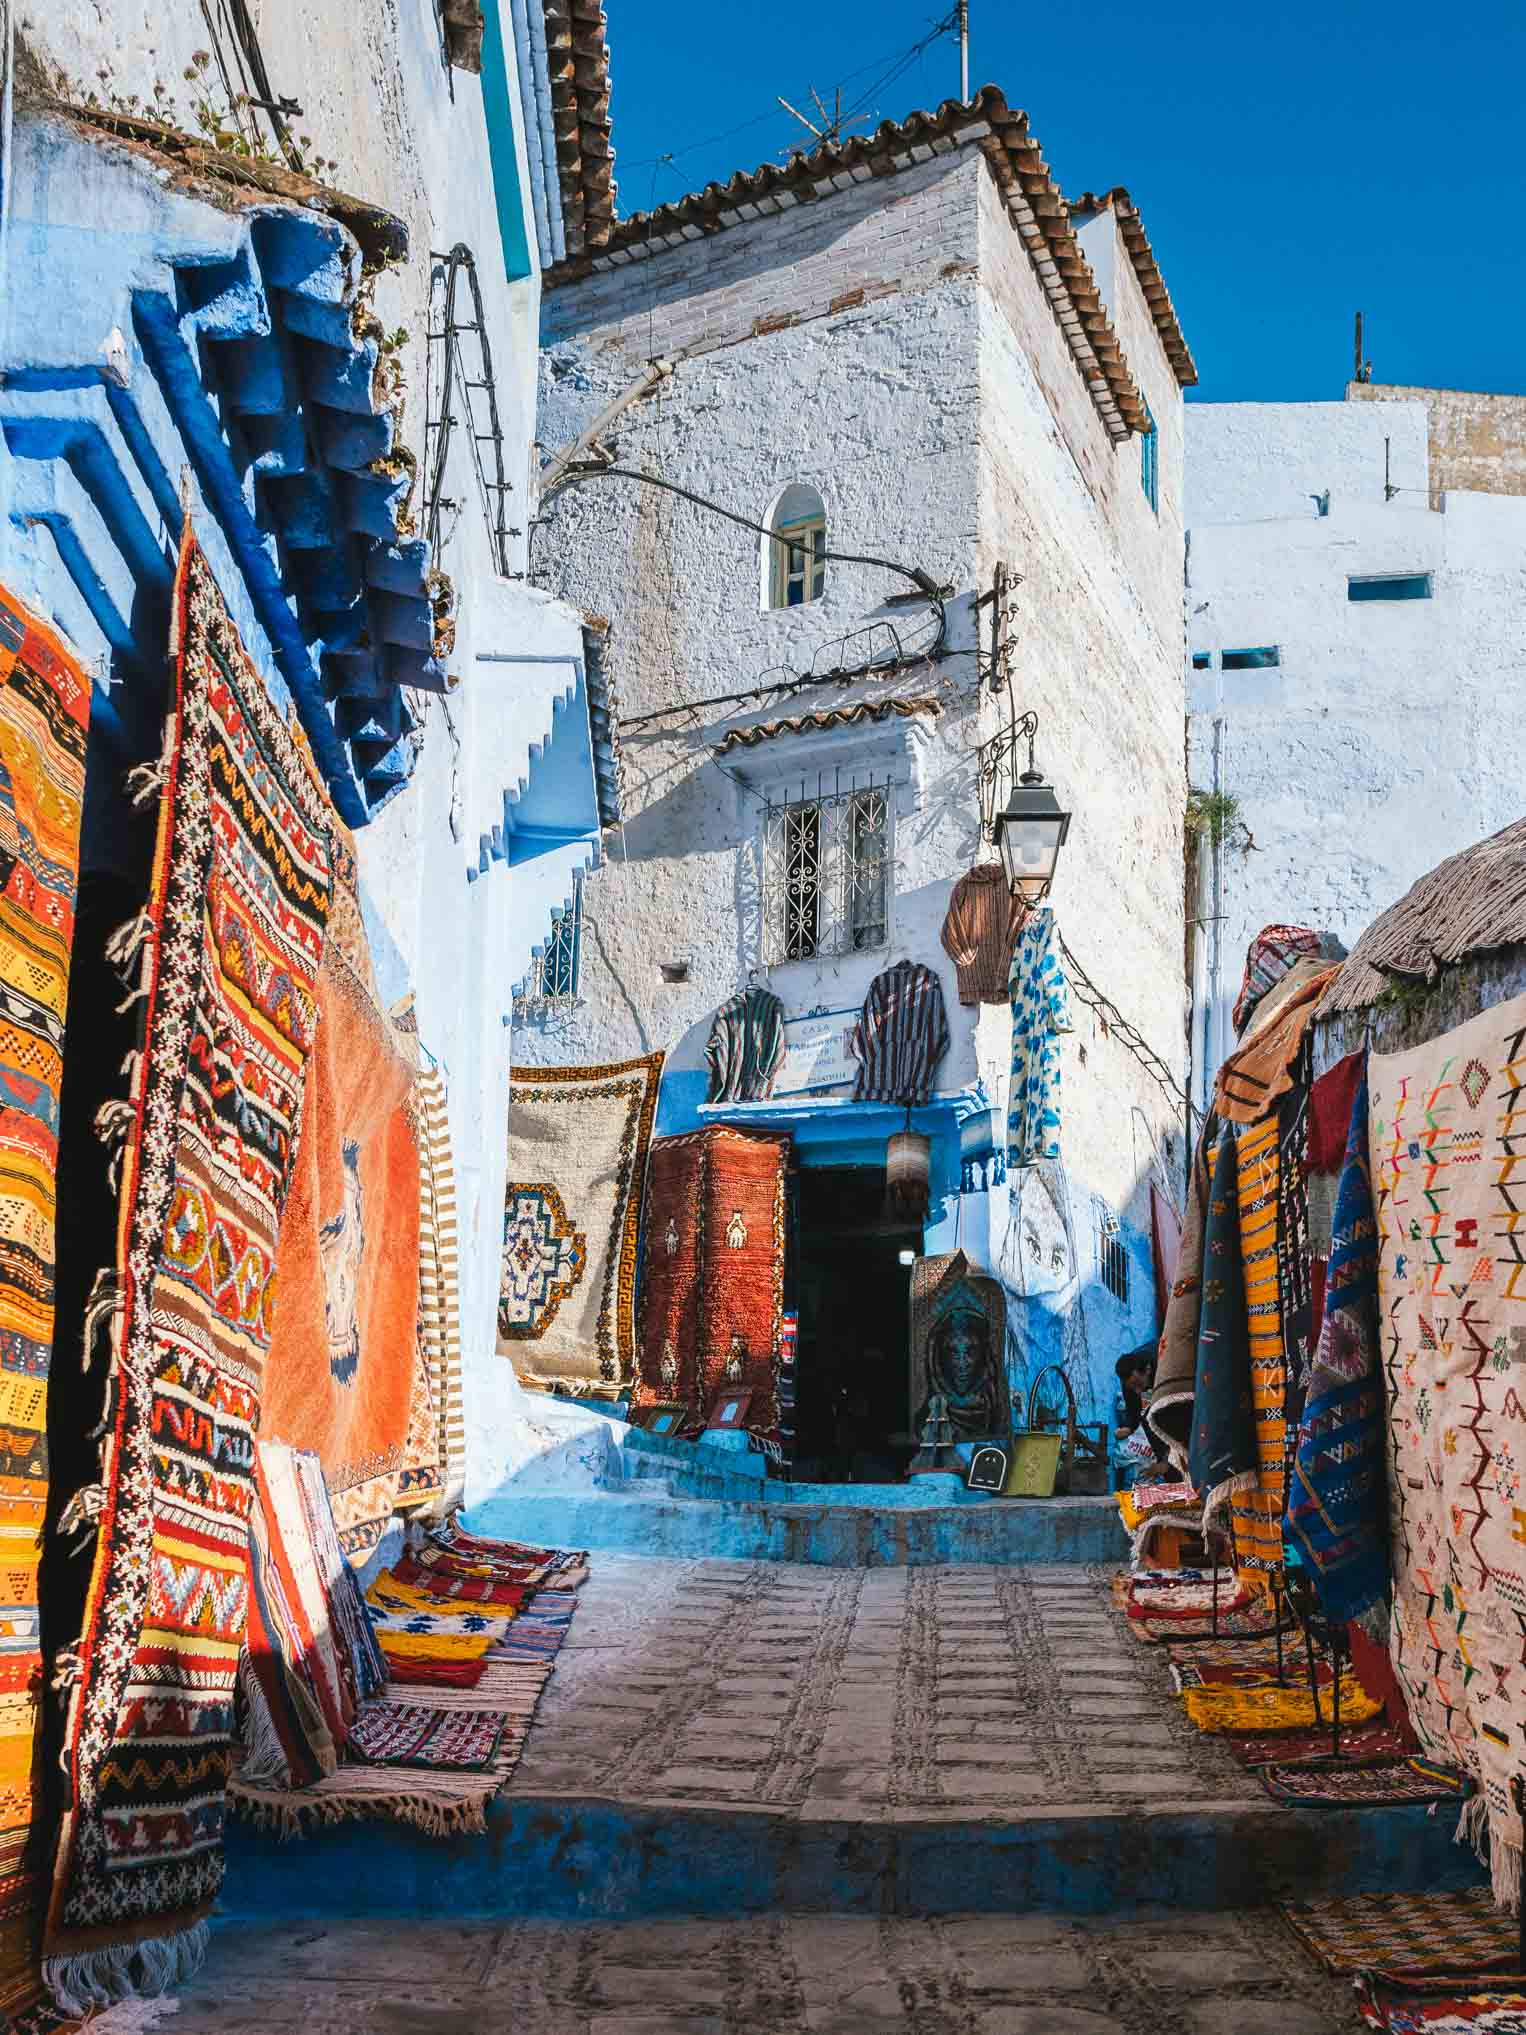 Tapis medina bleue - Nomade Amaoureux